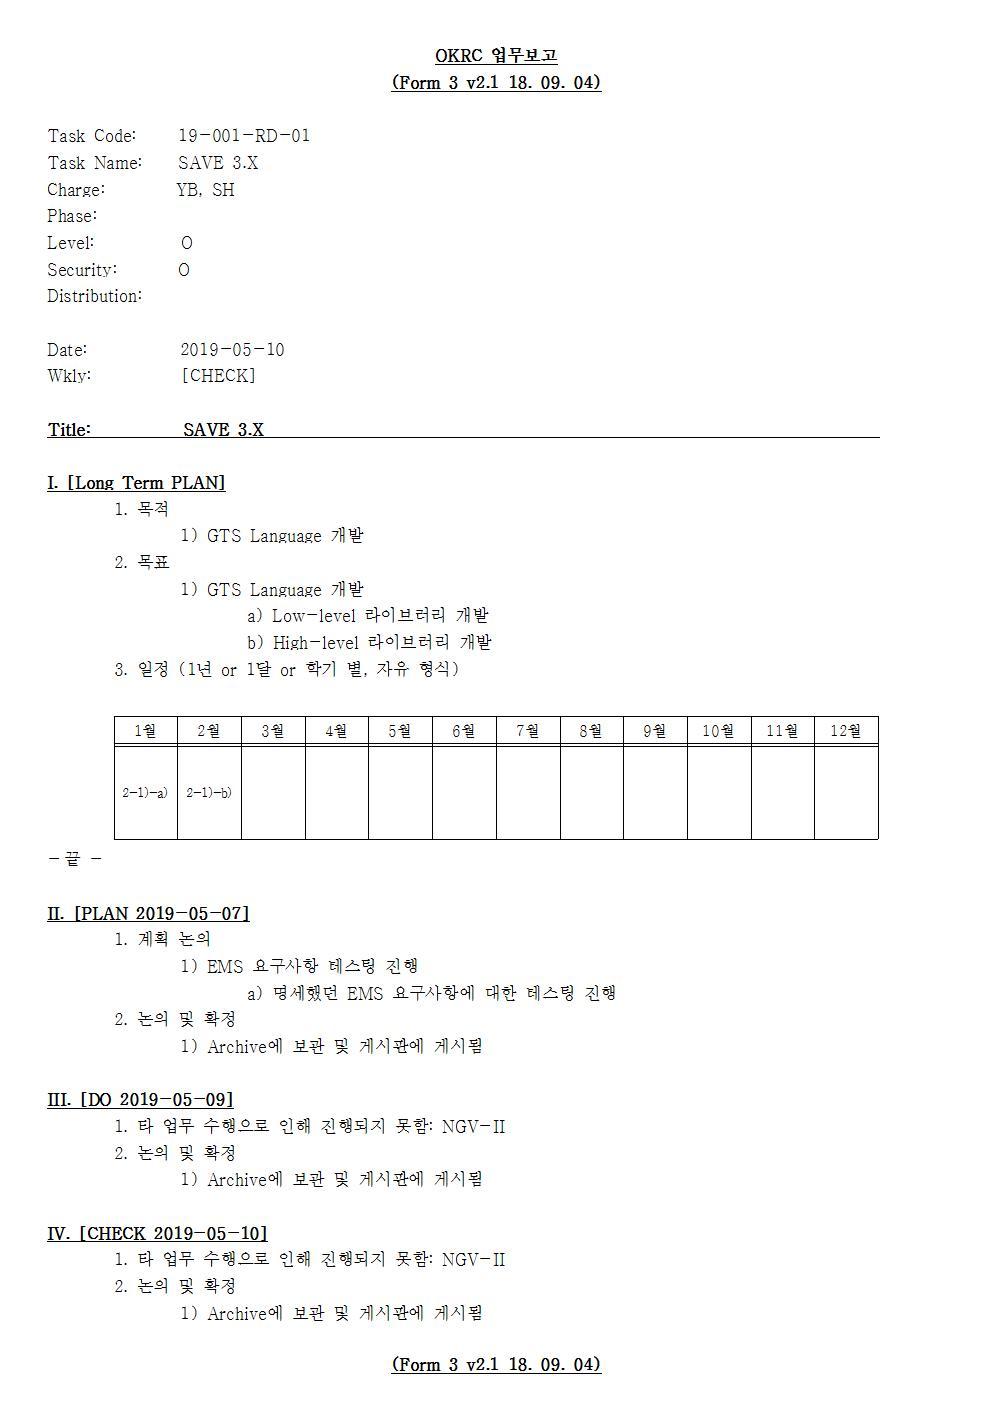 D-[19-001-RD-01]-[SAVE 3.X]-[2019-05-10][SH]001.jpg